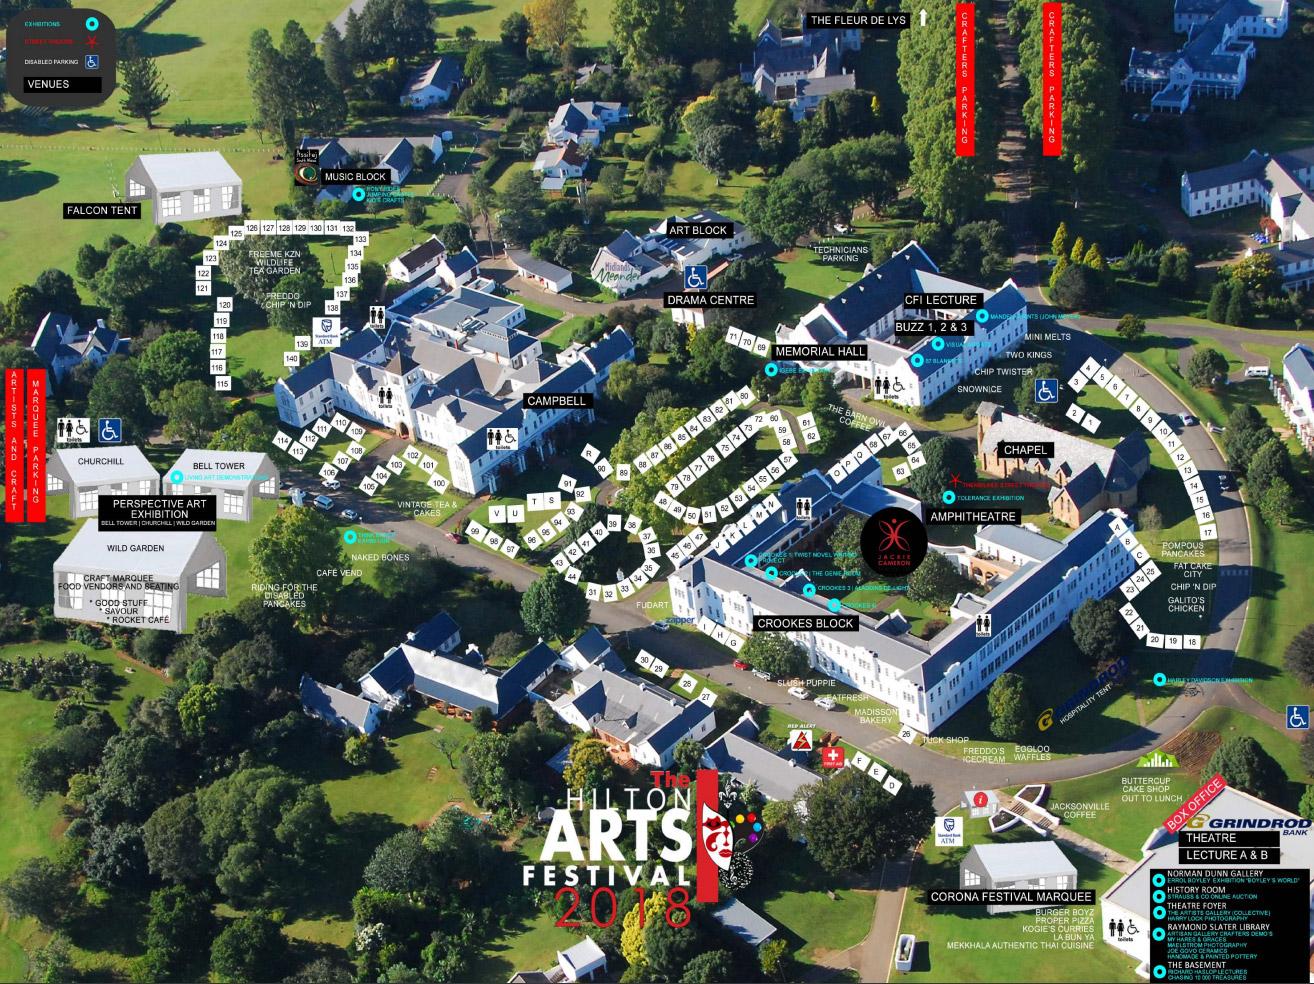 Hilton Arts Festival Map